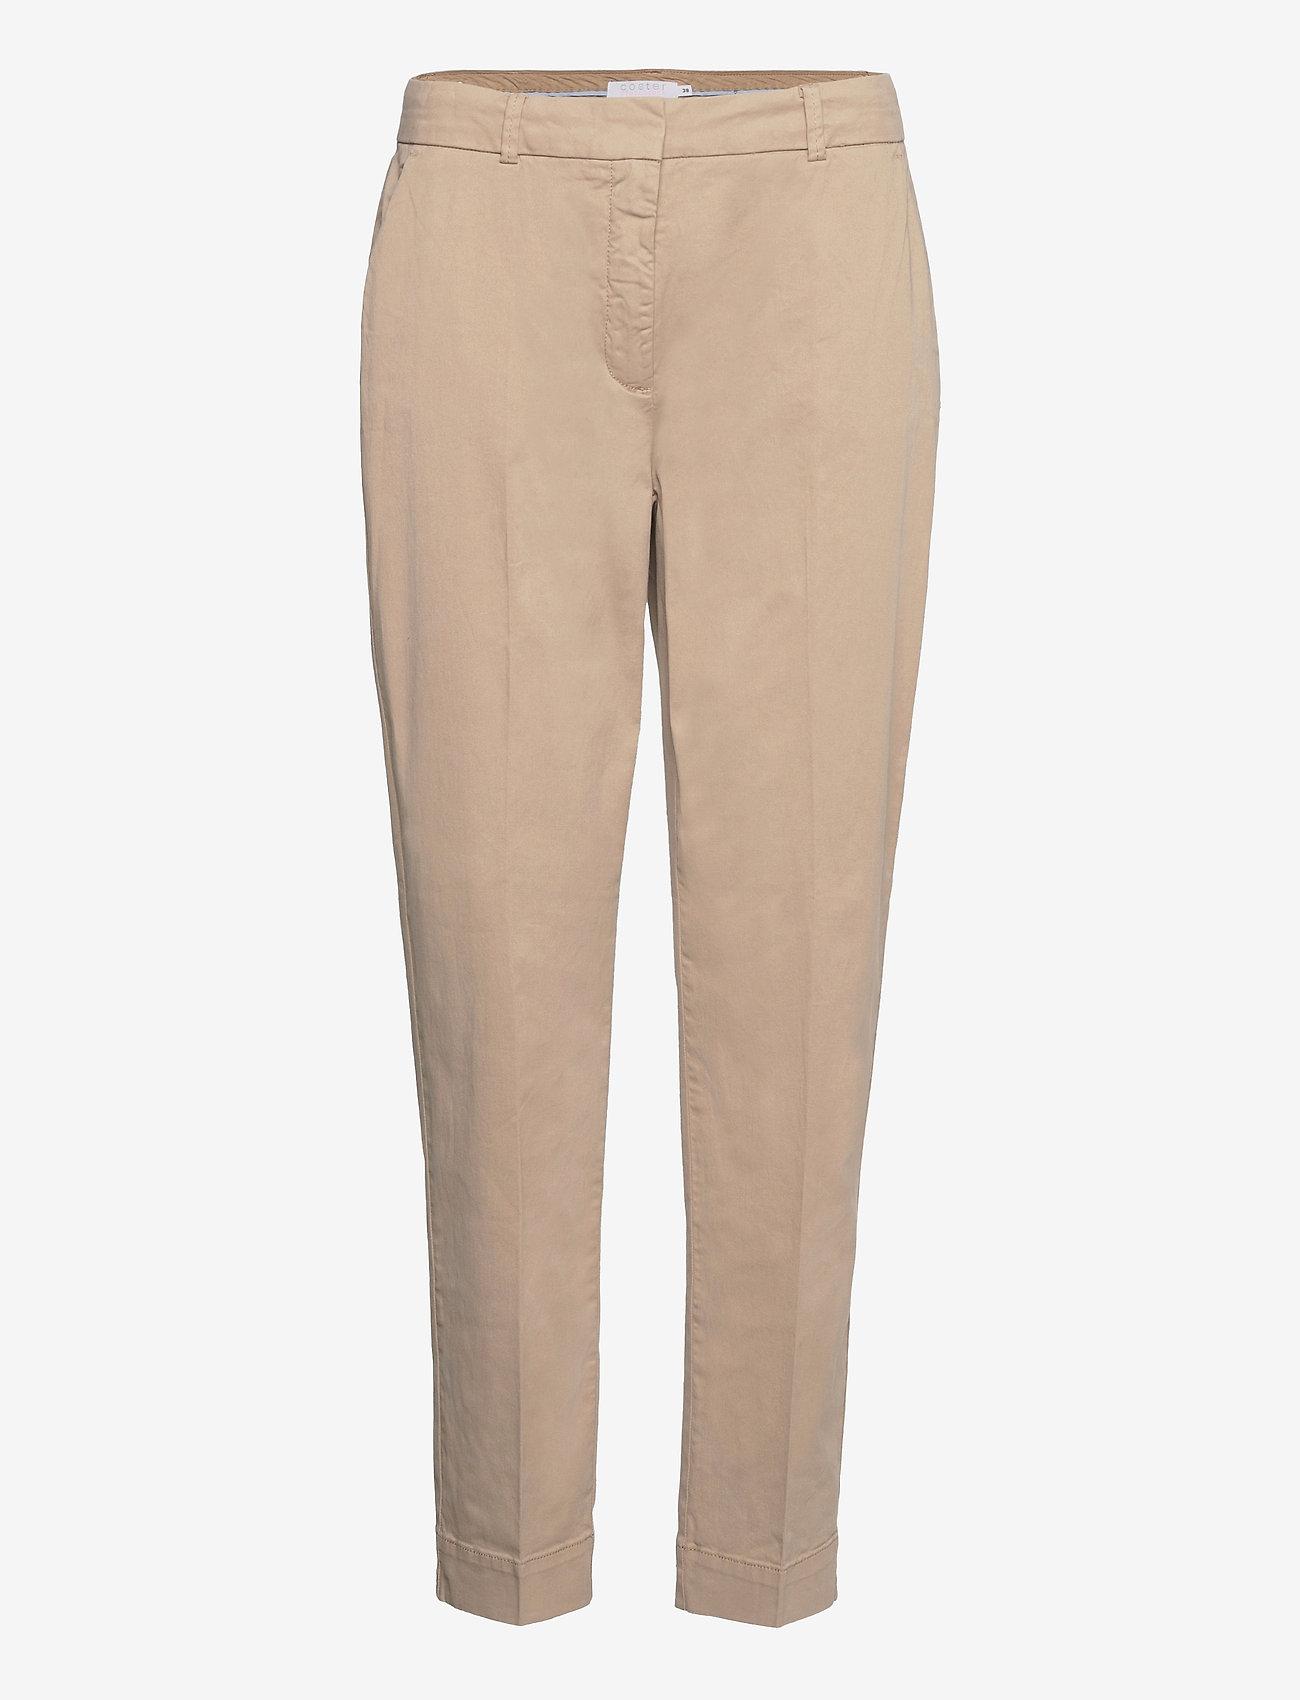 Coster Copenhagen - Chino pants w. press fold and paspe - chinos - khaki - 0